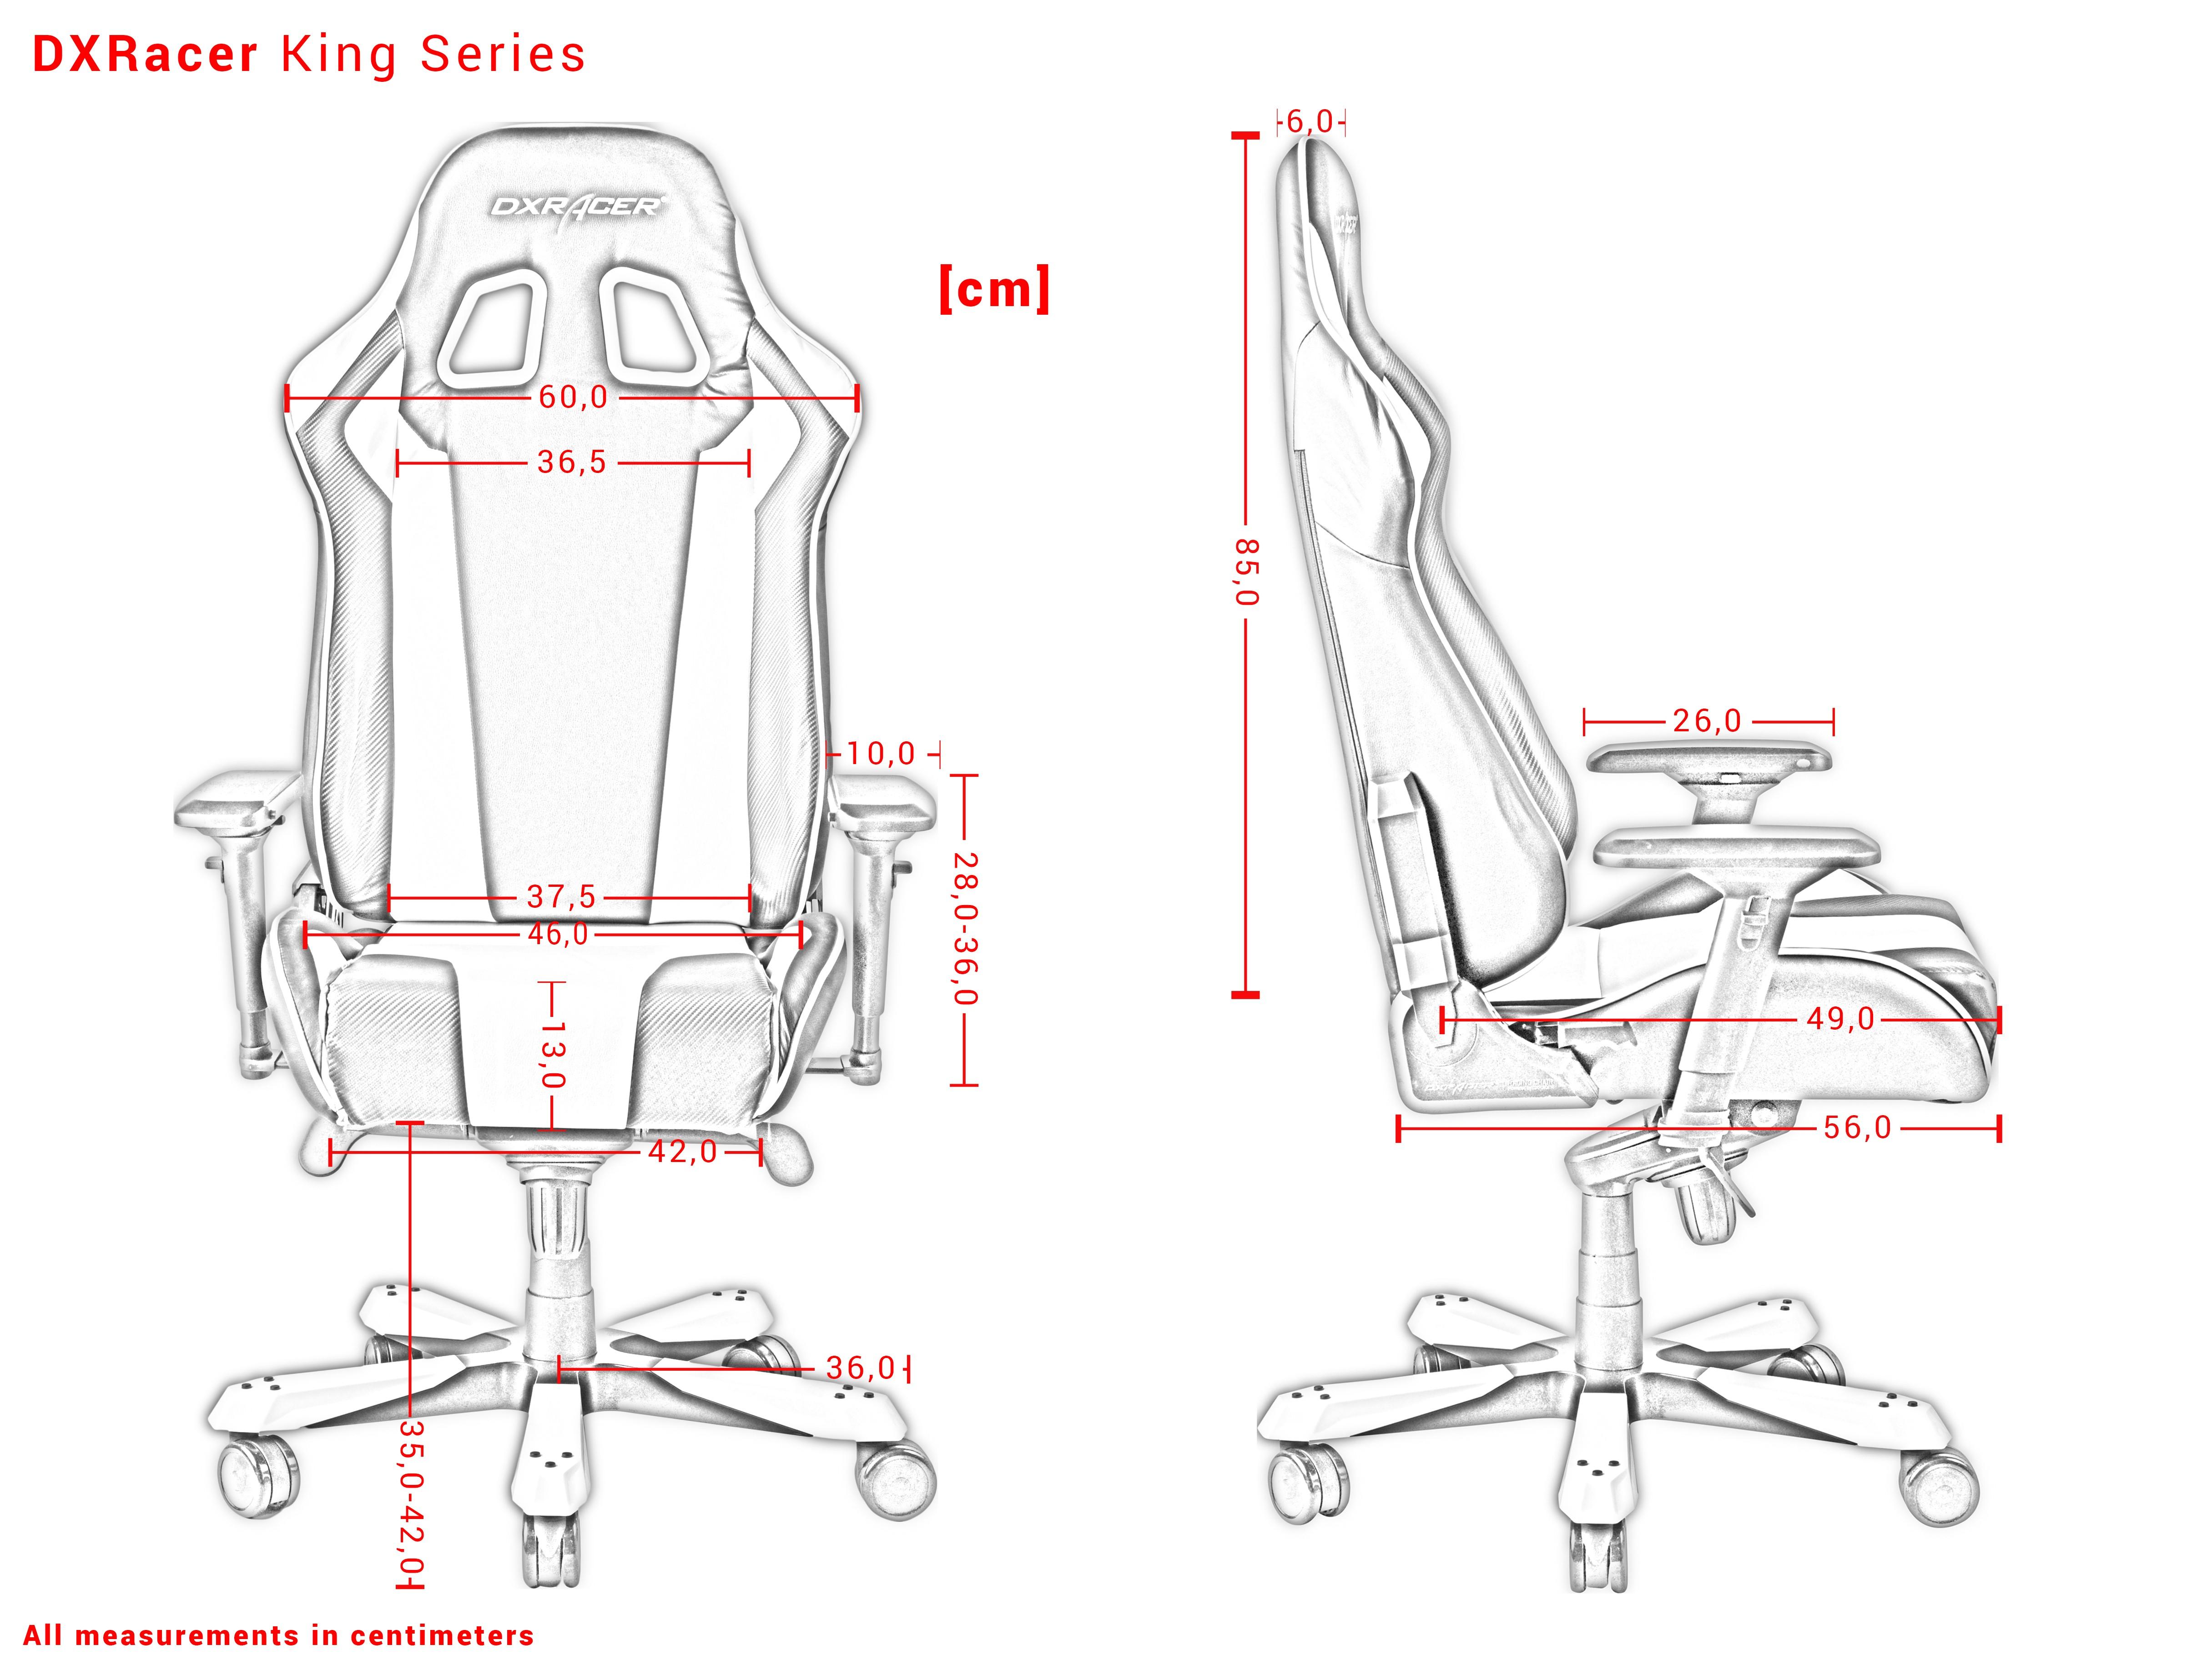 DXRACER KING SERIES K06-NE GREEN GAMING CHAIR